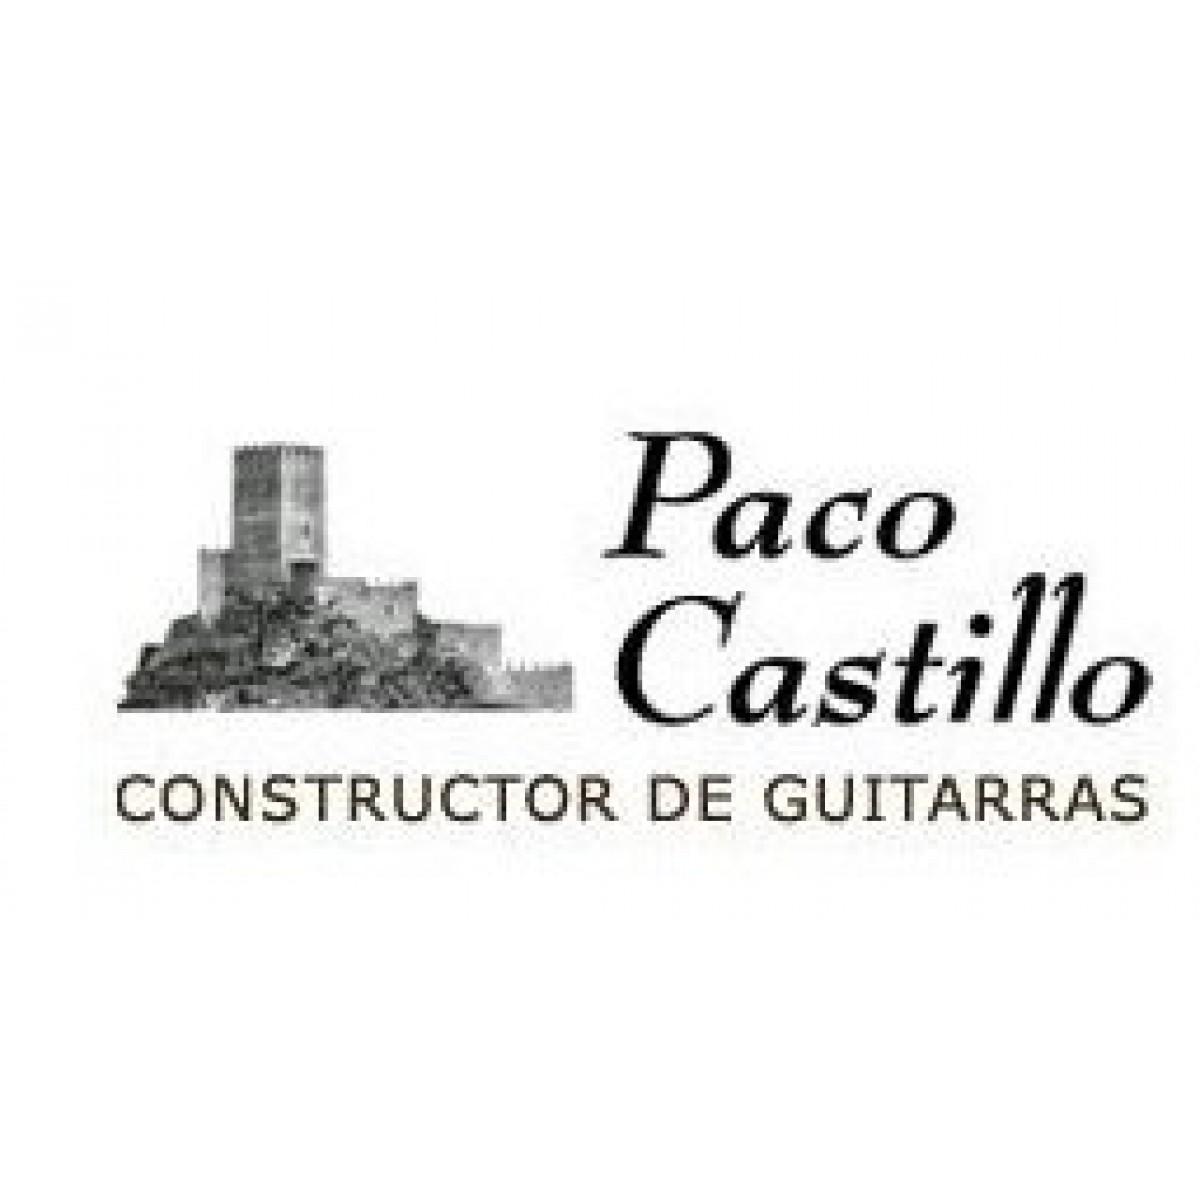 Paco Castillo